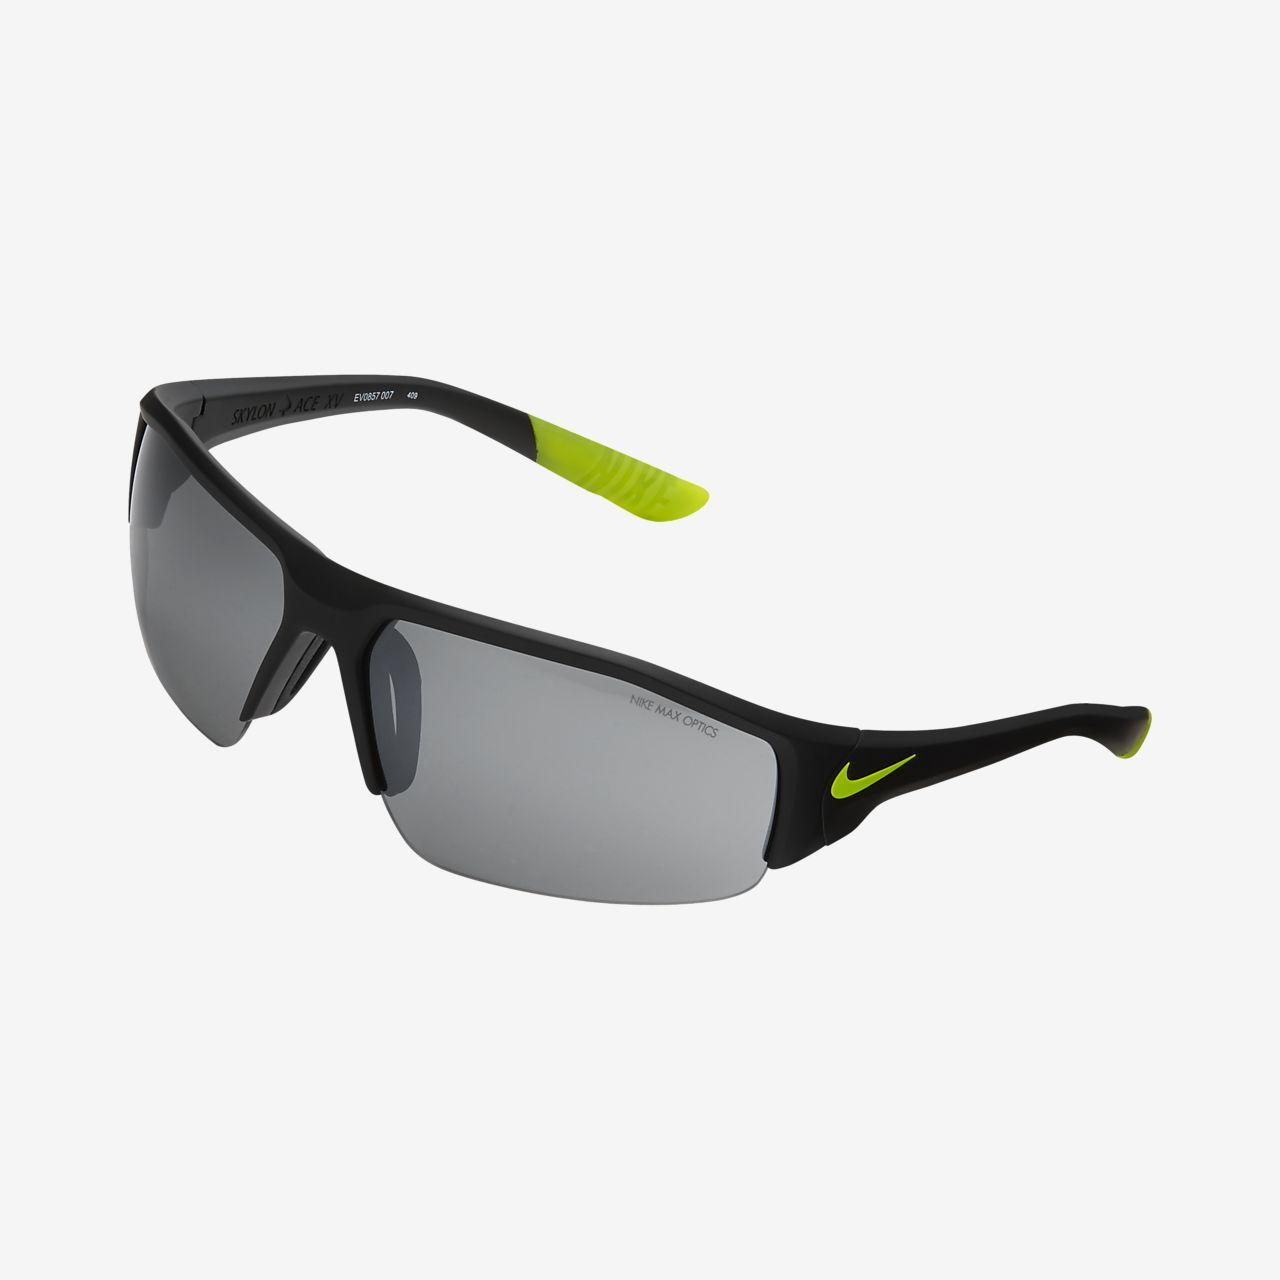 16a786b0ea Nike Skylon Ace XV Gafas de sol. Nike.com ES